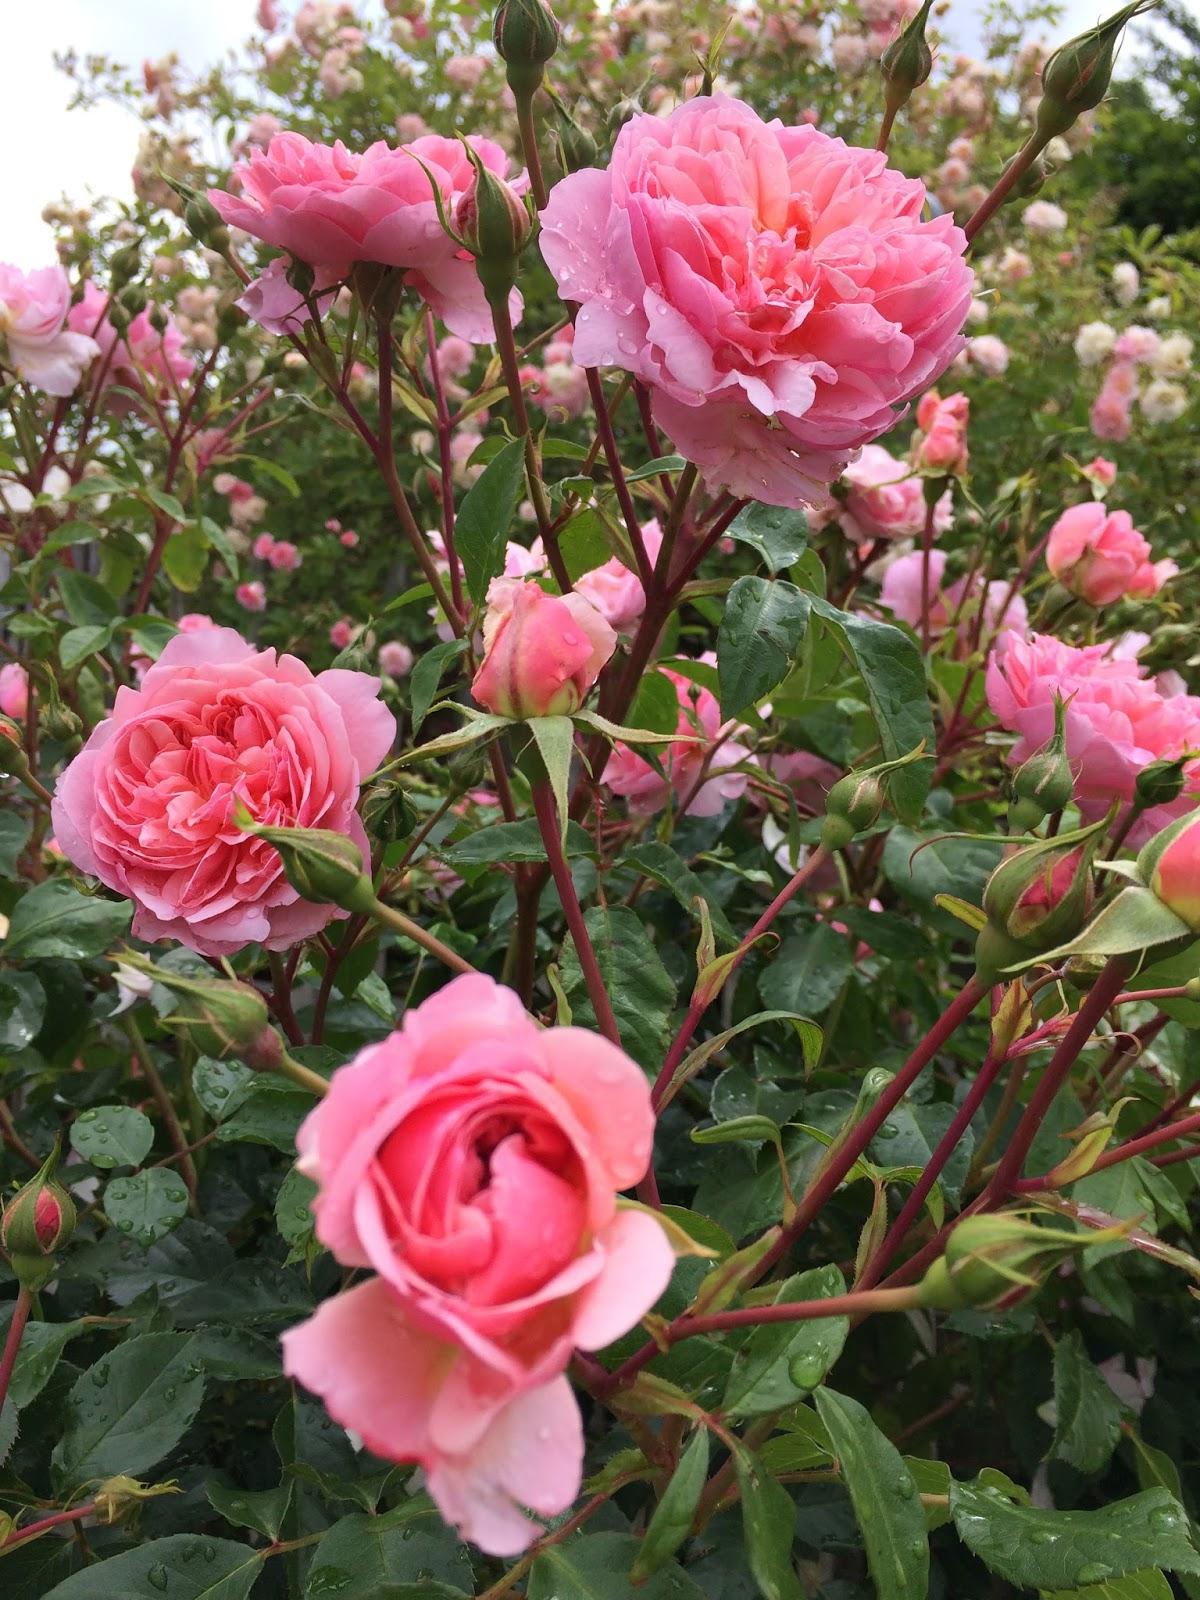 La Passion Des Rosiers A La Pepiniere Fil Roses 2017